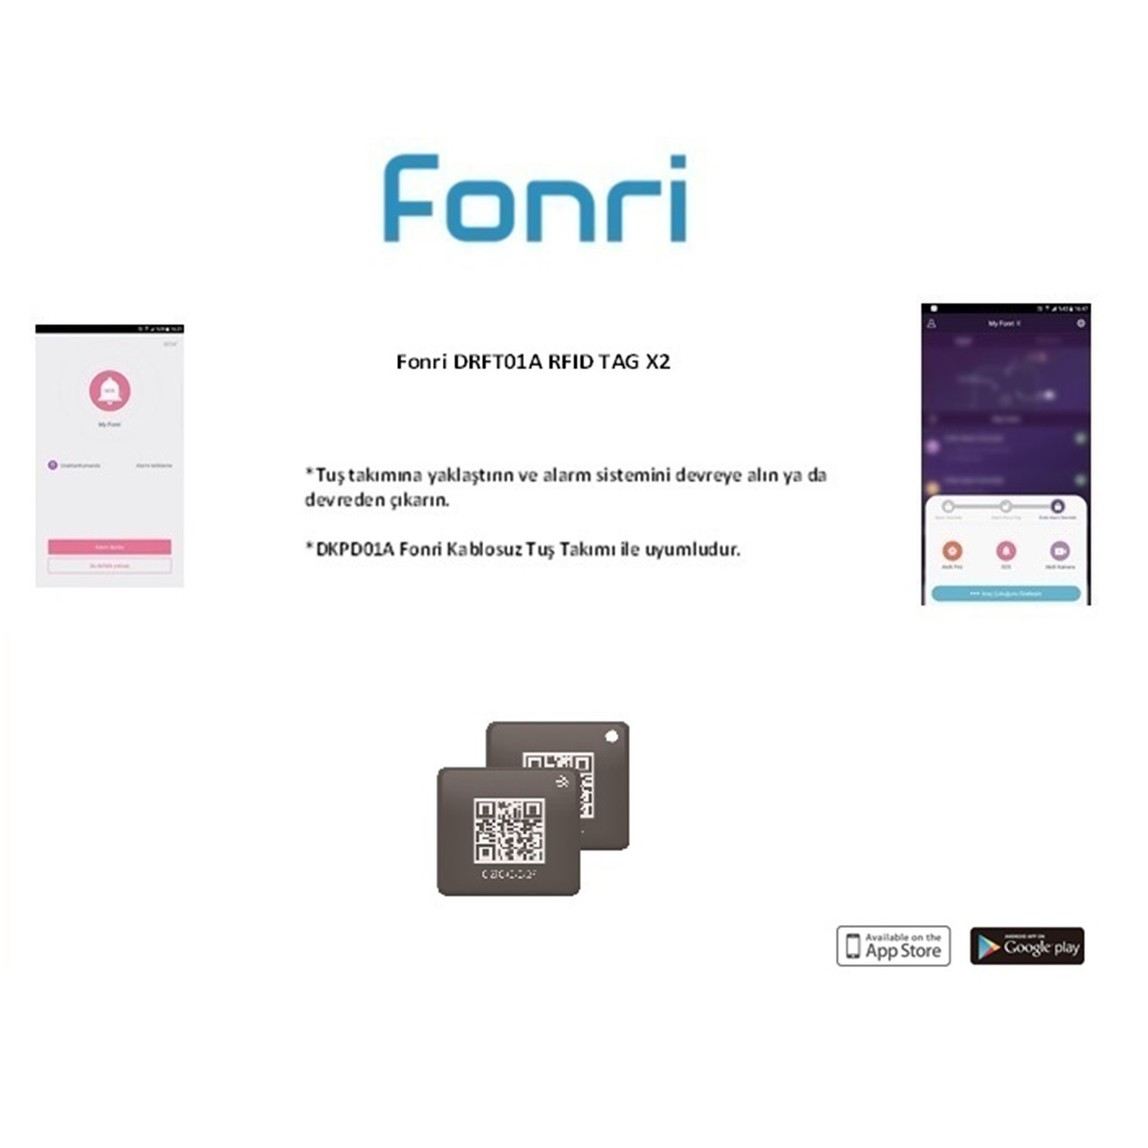 Fonri RFID Tag DRFT01A